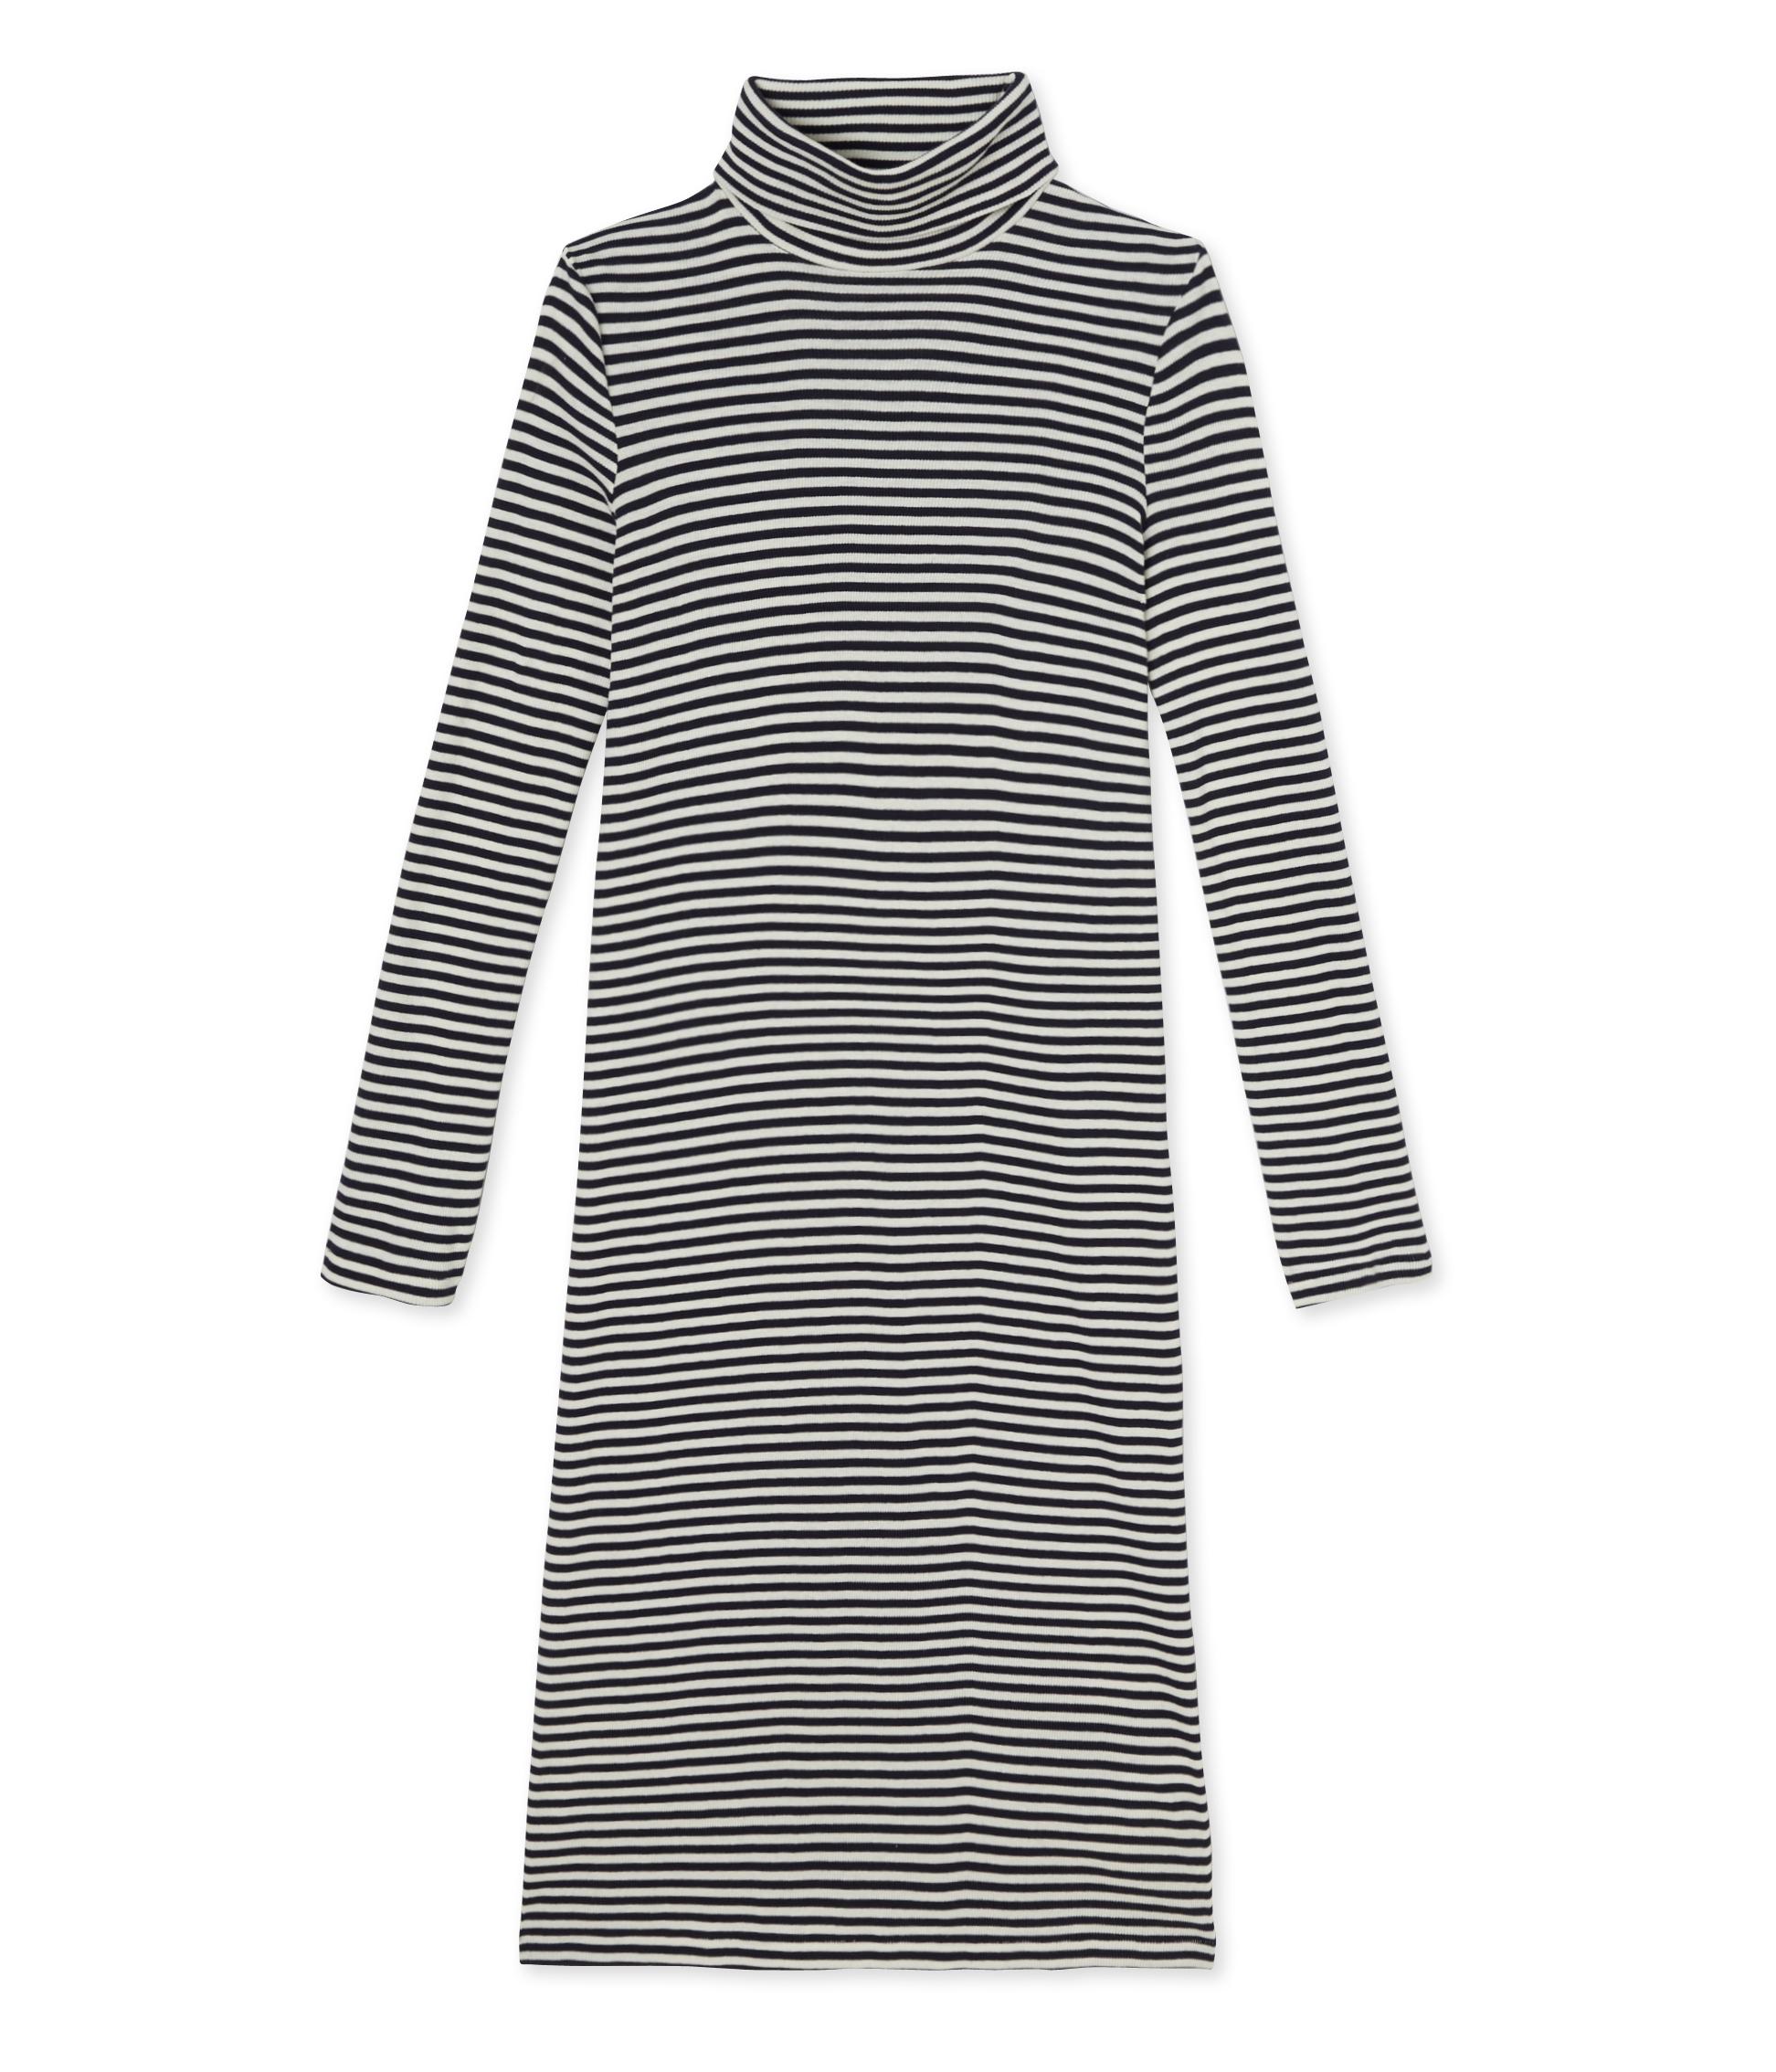 c1e8a7b274e791 Women's striped roll-neck dress in ultra light cotton   Petit Bateau